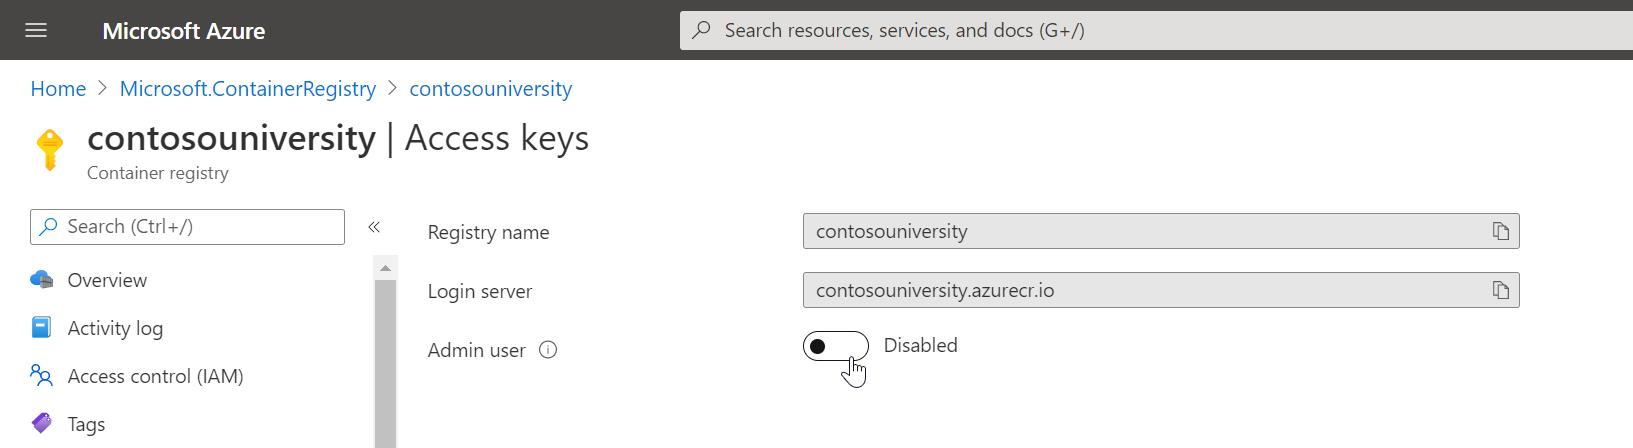 ACR 預設並沒有啟用 Admin user 帳號